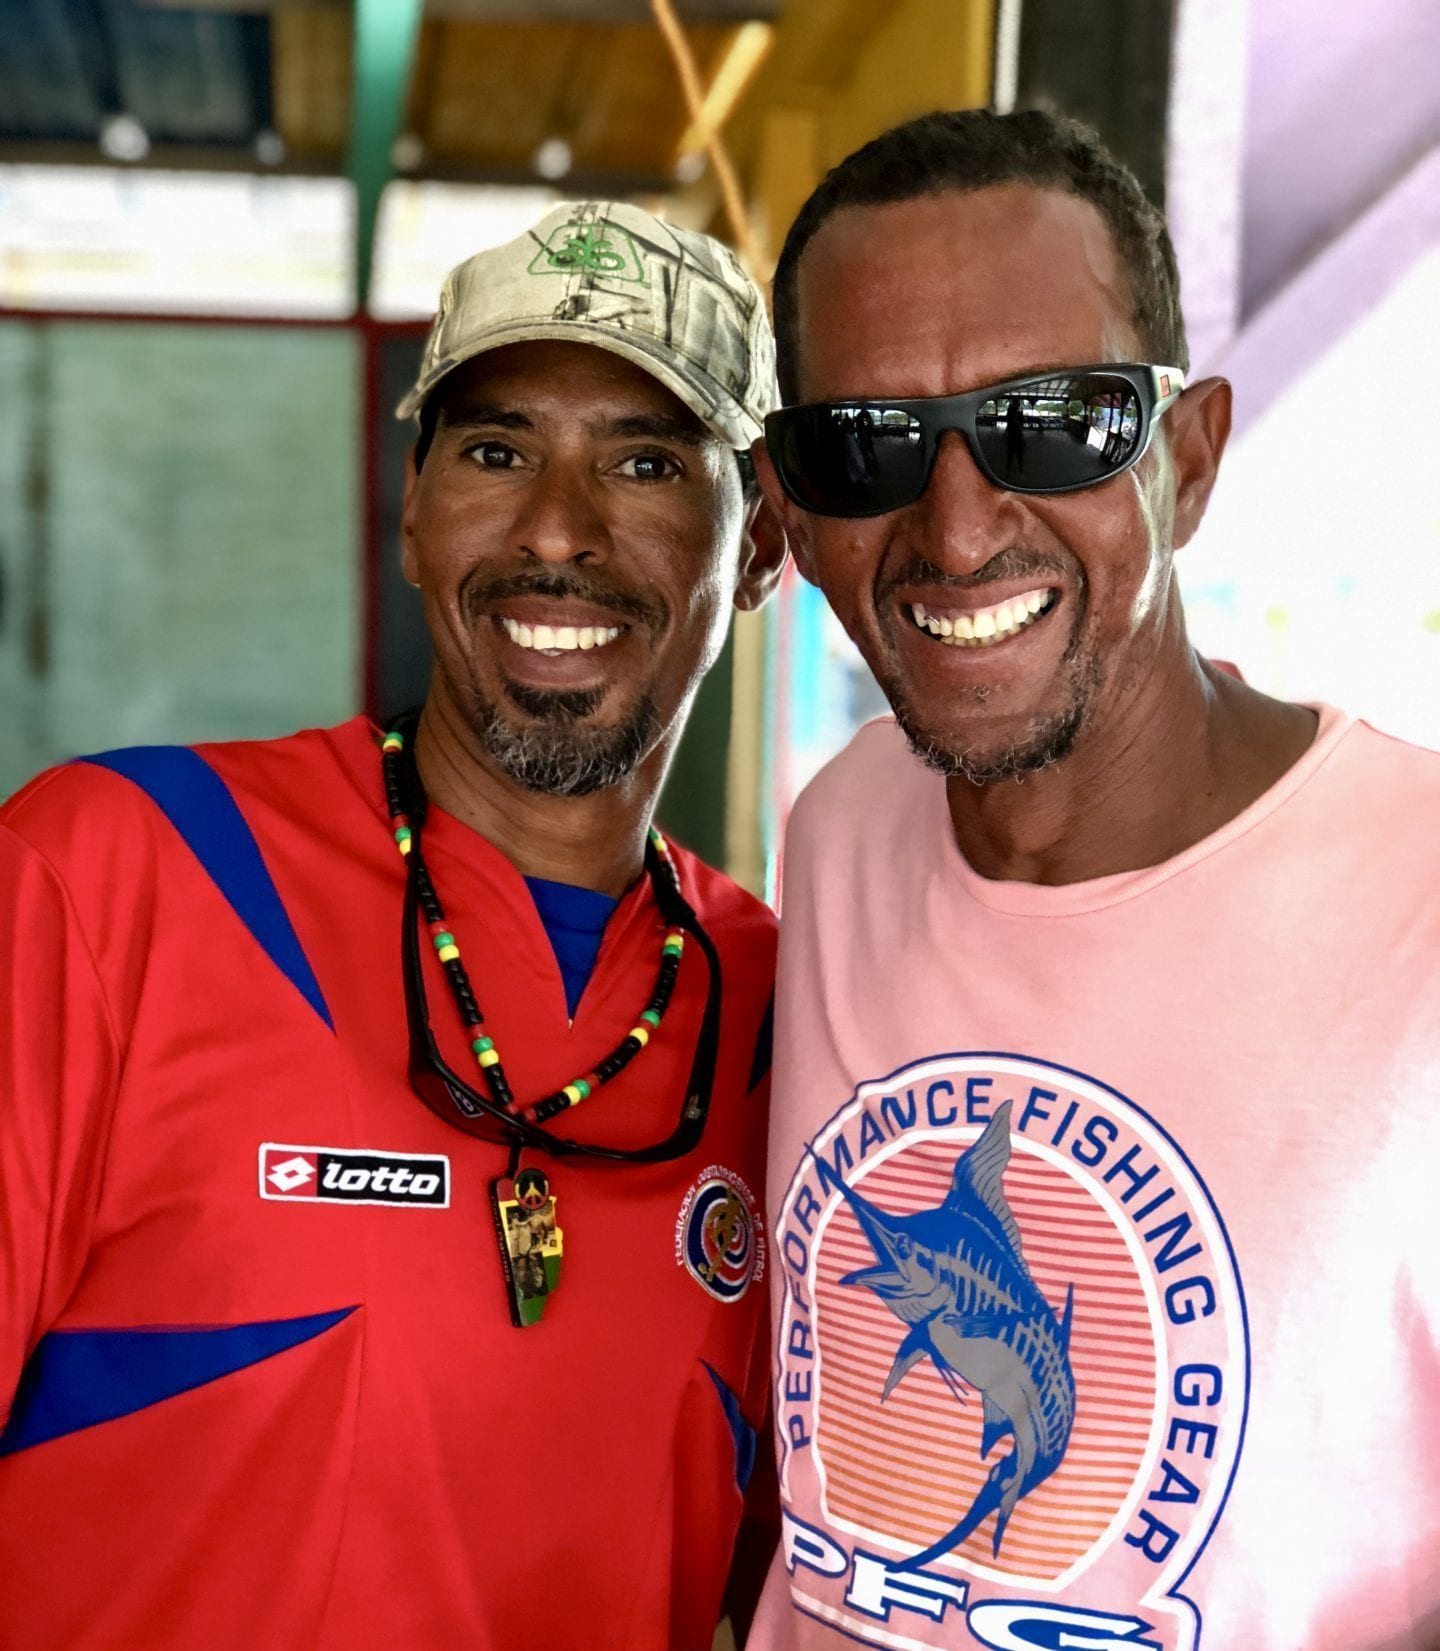 friendly Belizean smiles